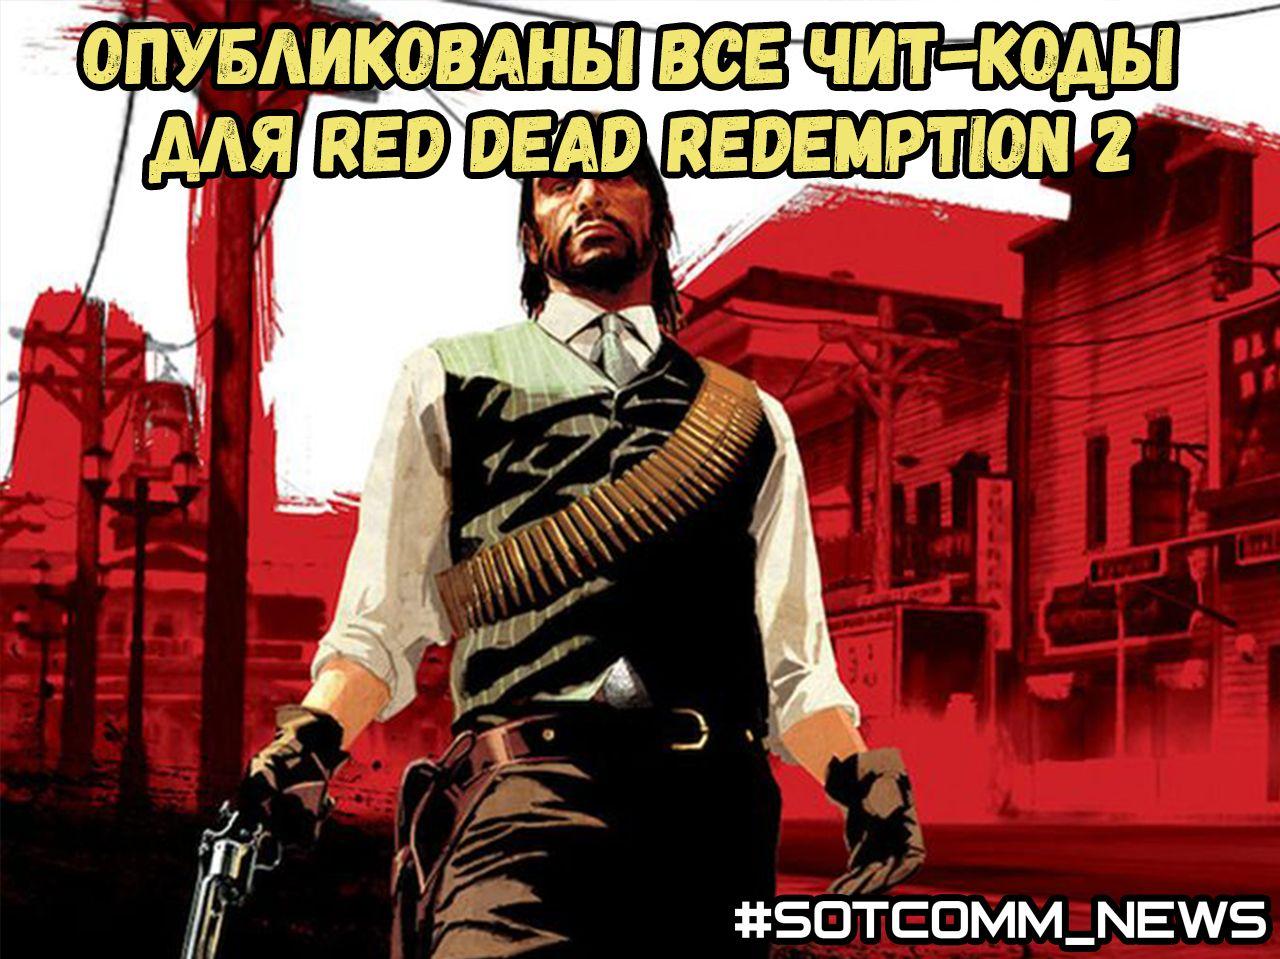 Опубликованы все чит-коды для Red Dead Redemption 2